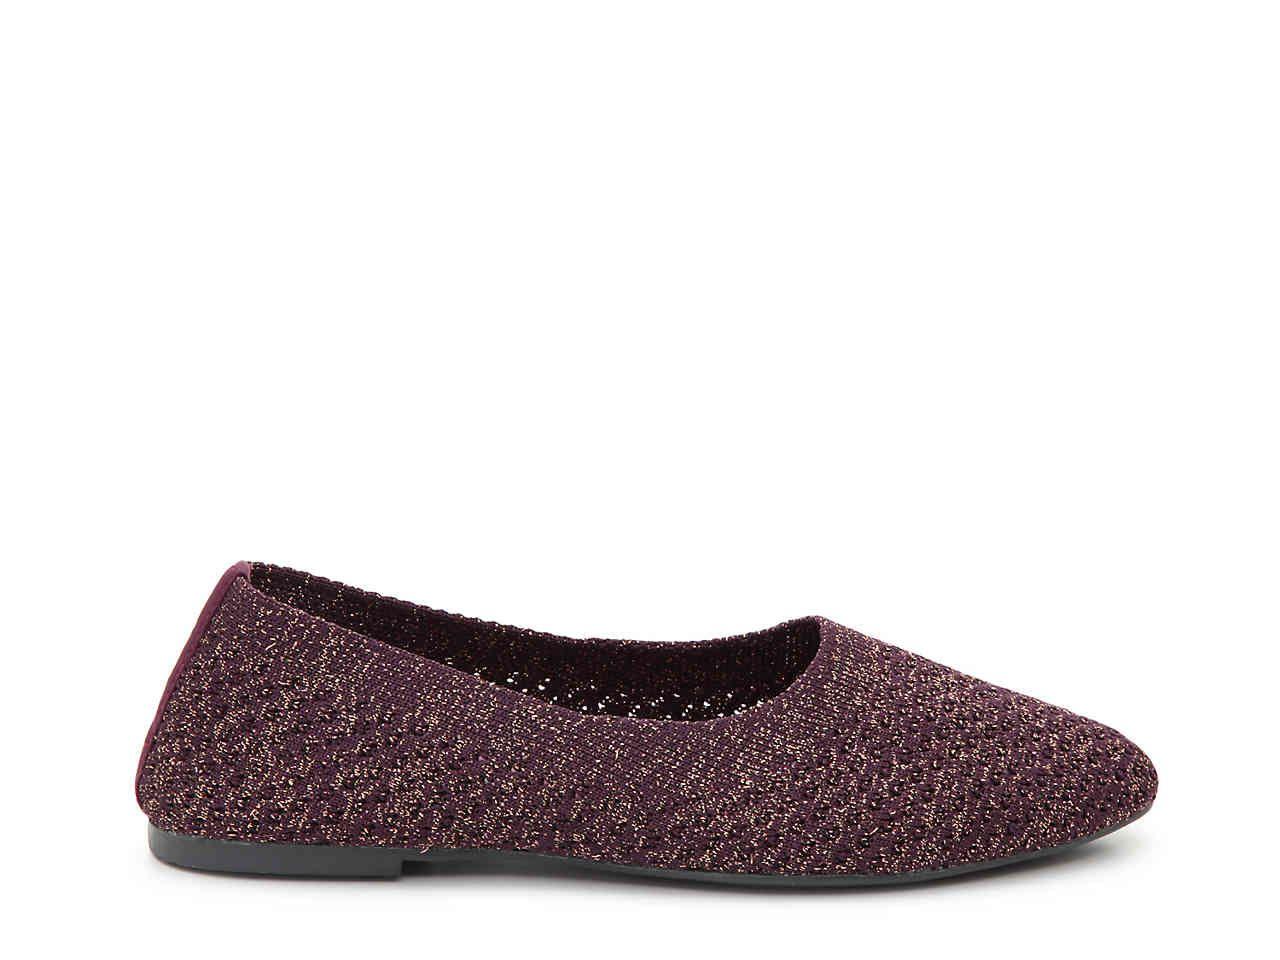 Skechers Cleo Flat   Flat shoes women